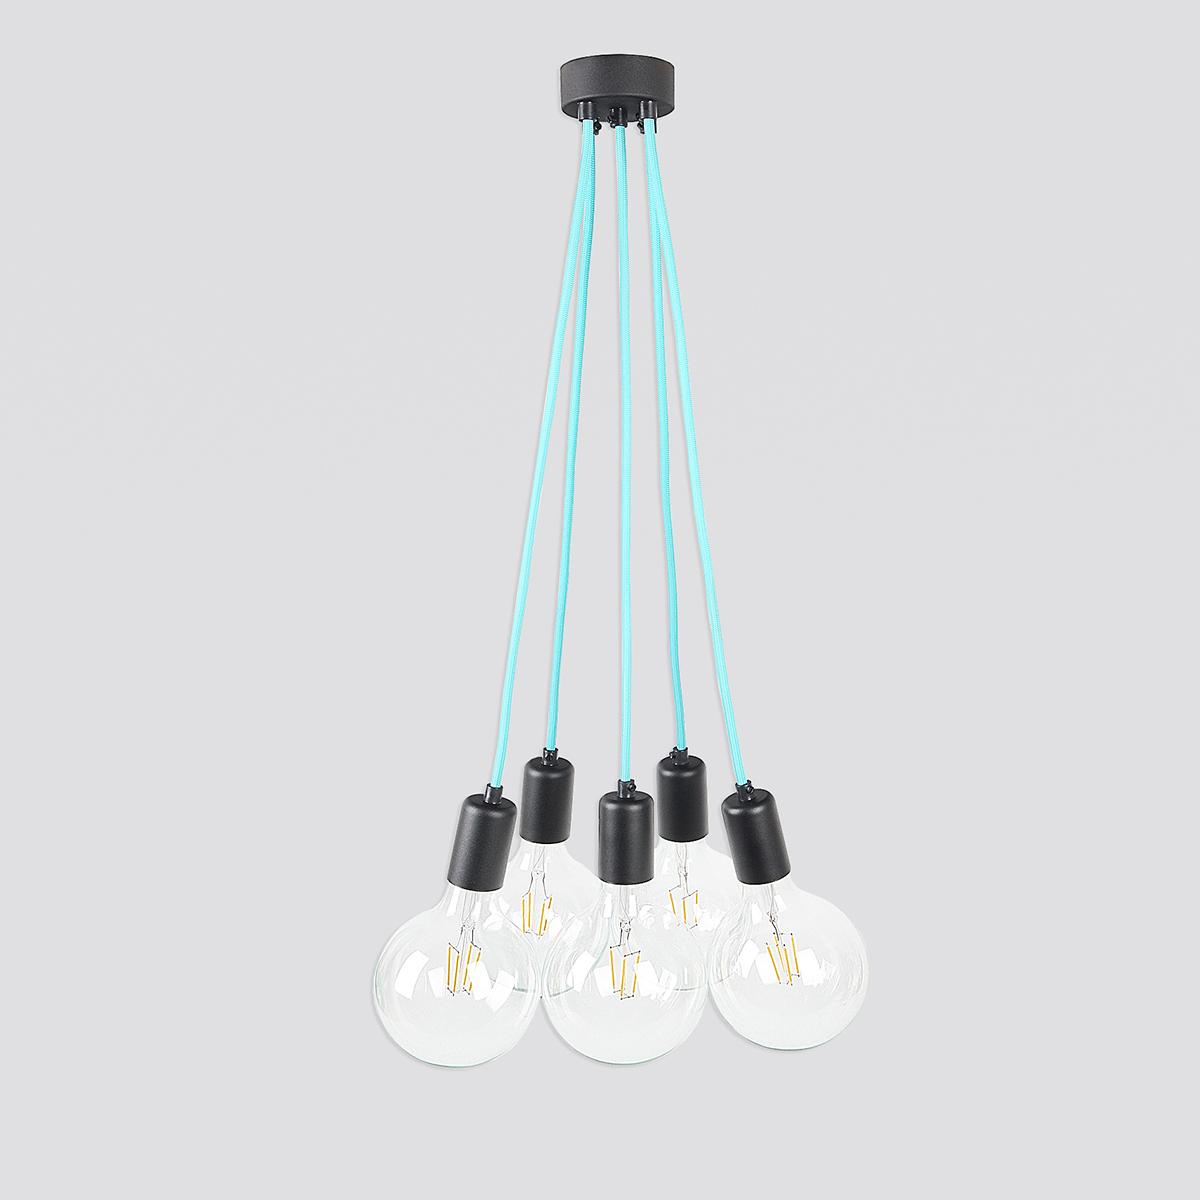 Zdjęcie produktu LAMPA LOFT CableFIVE